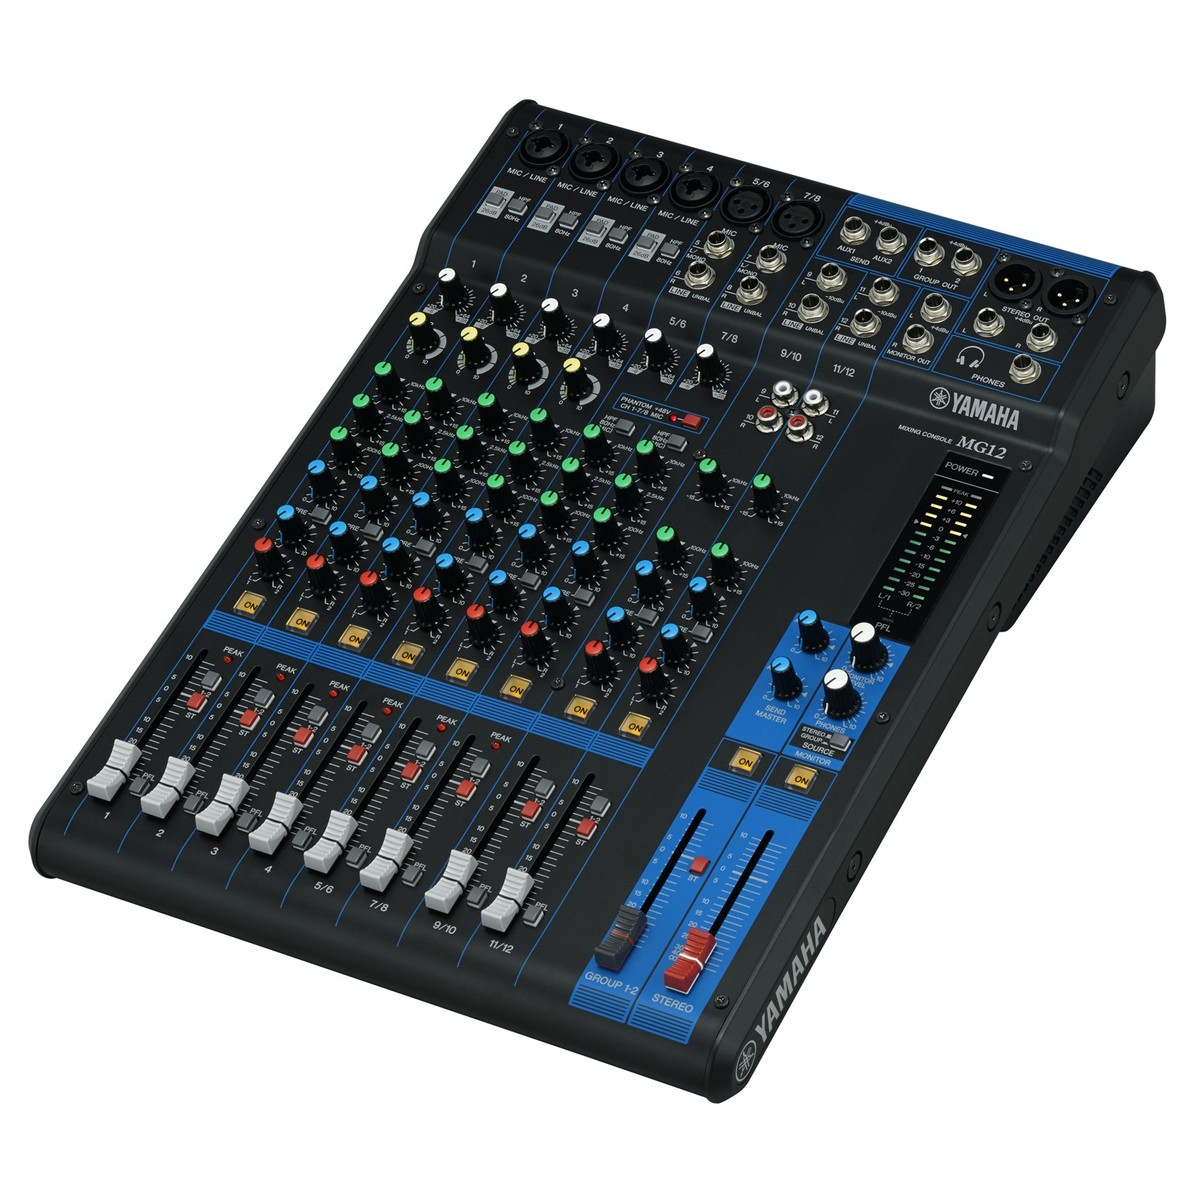 Yamaha mg12 table de mixage analogique gear4music for Table yamaha